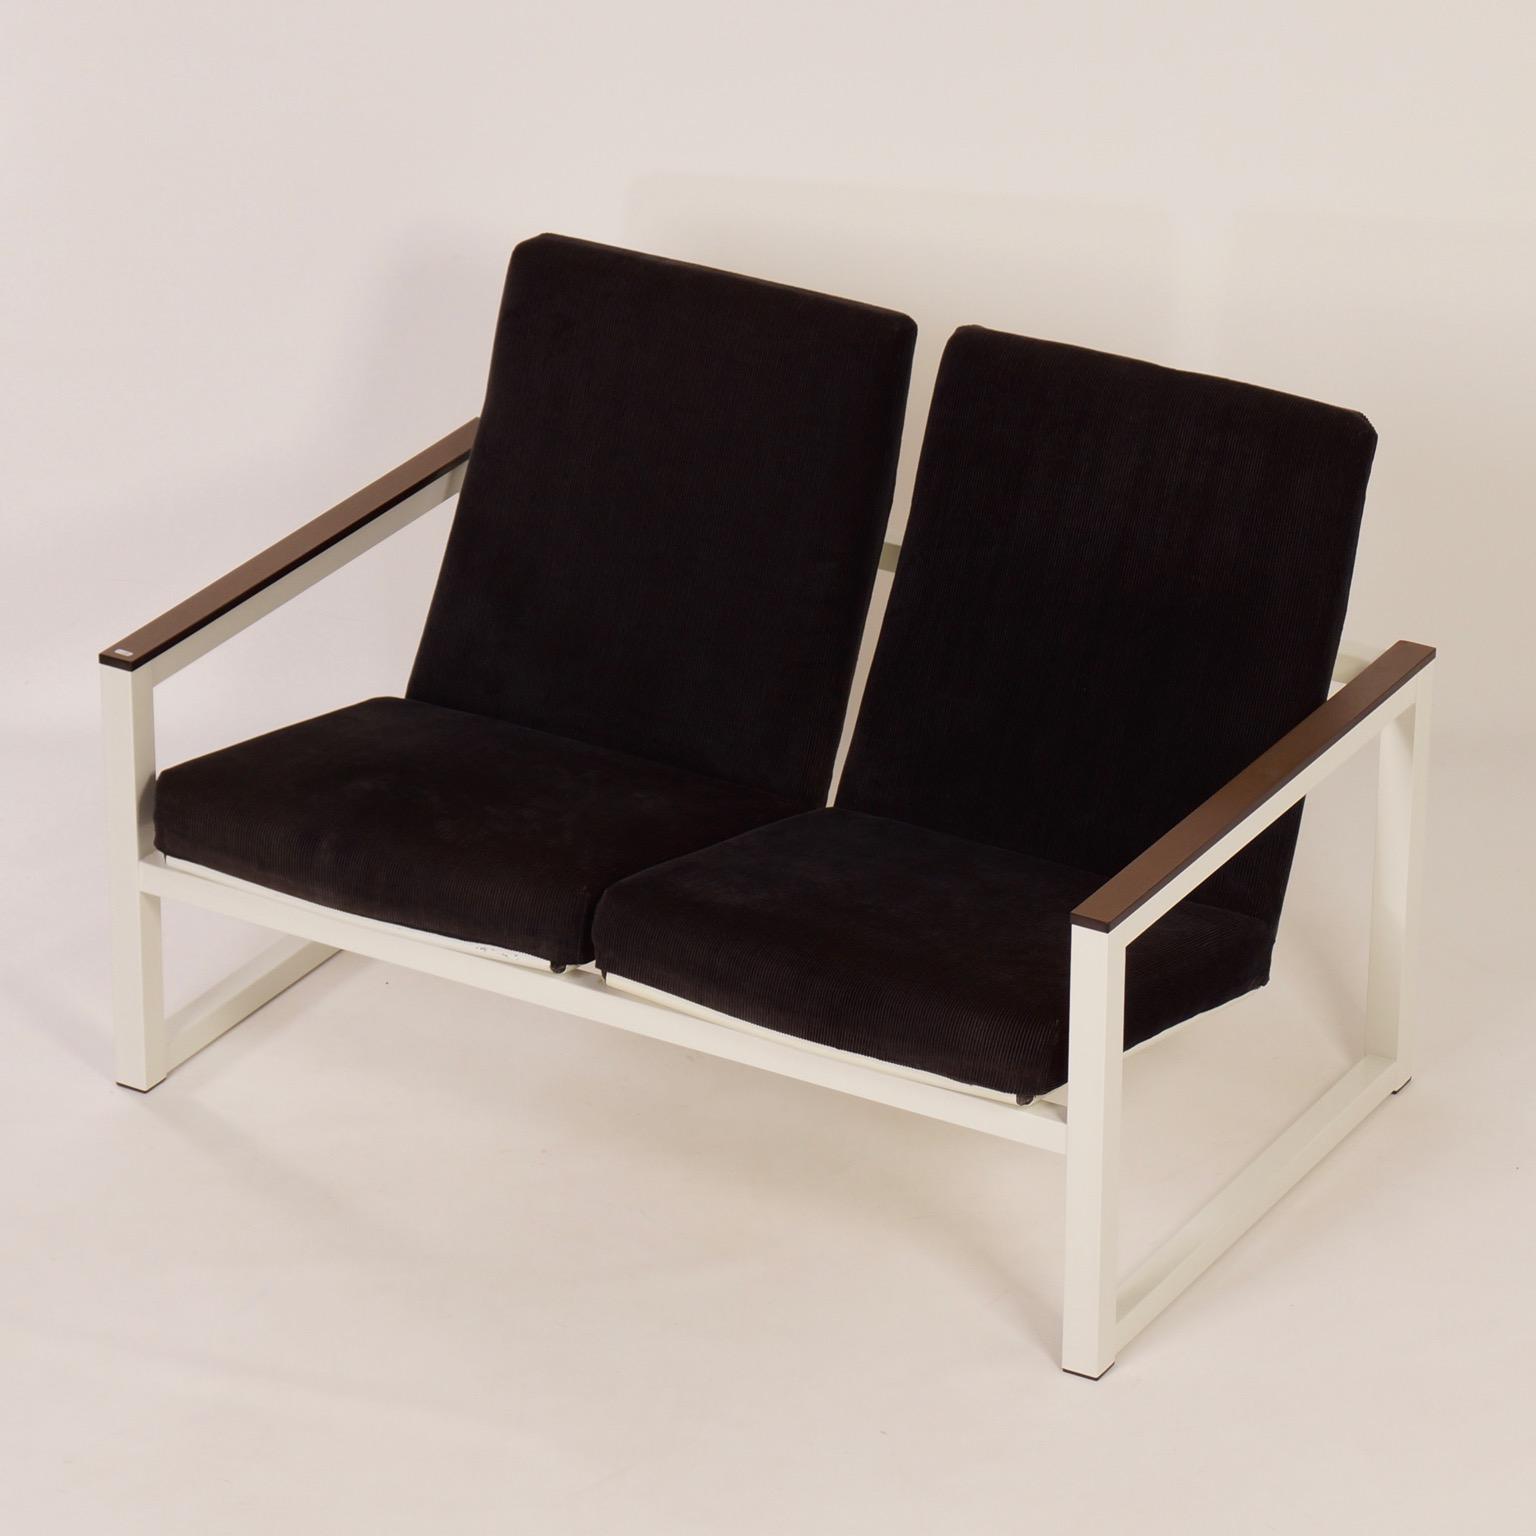 Miraculous Rare 2 Seater Sofa By Tjerk Reijenga And Friso Kramer For Pilastro 1960S Uwap Interior Chair Design Uwaporg